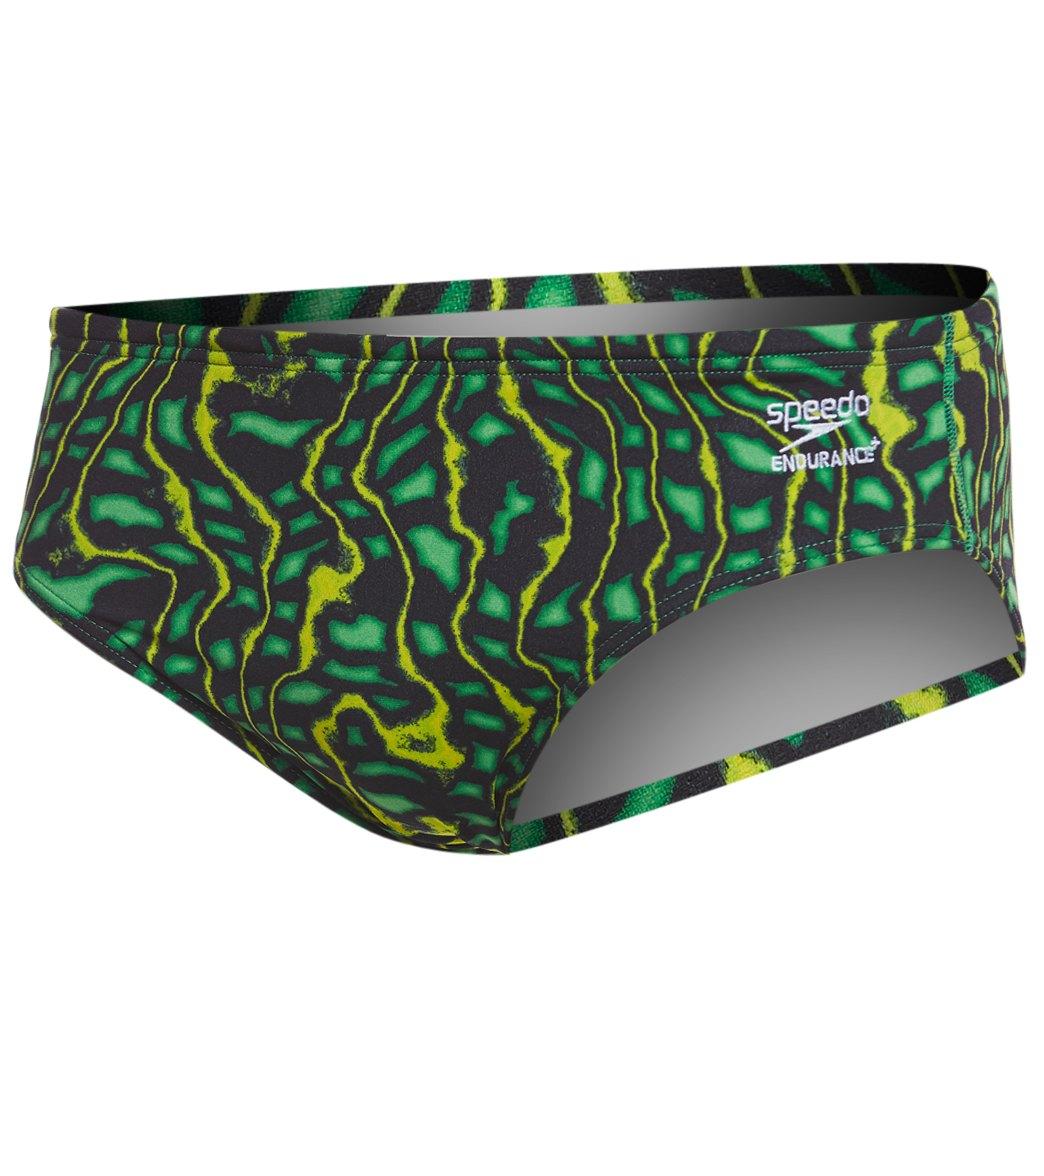 76f9ae697c Speedo Endurance+ Men's Amplified Pulse Brief Swimsuit at ...